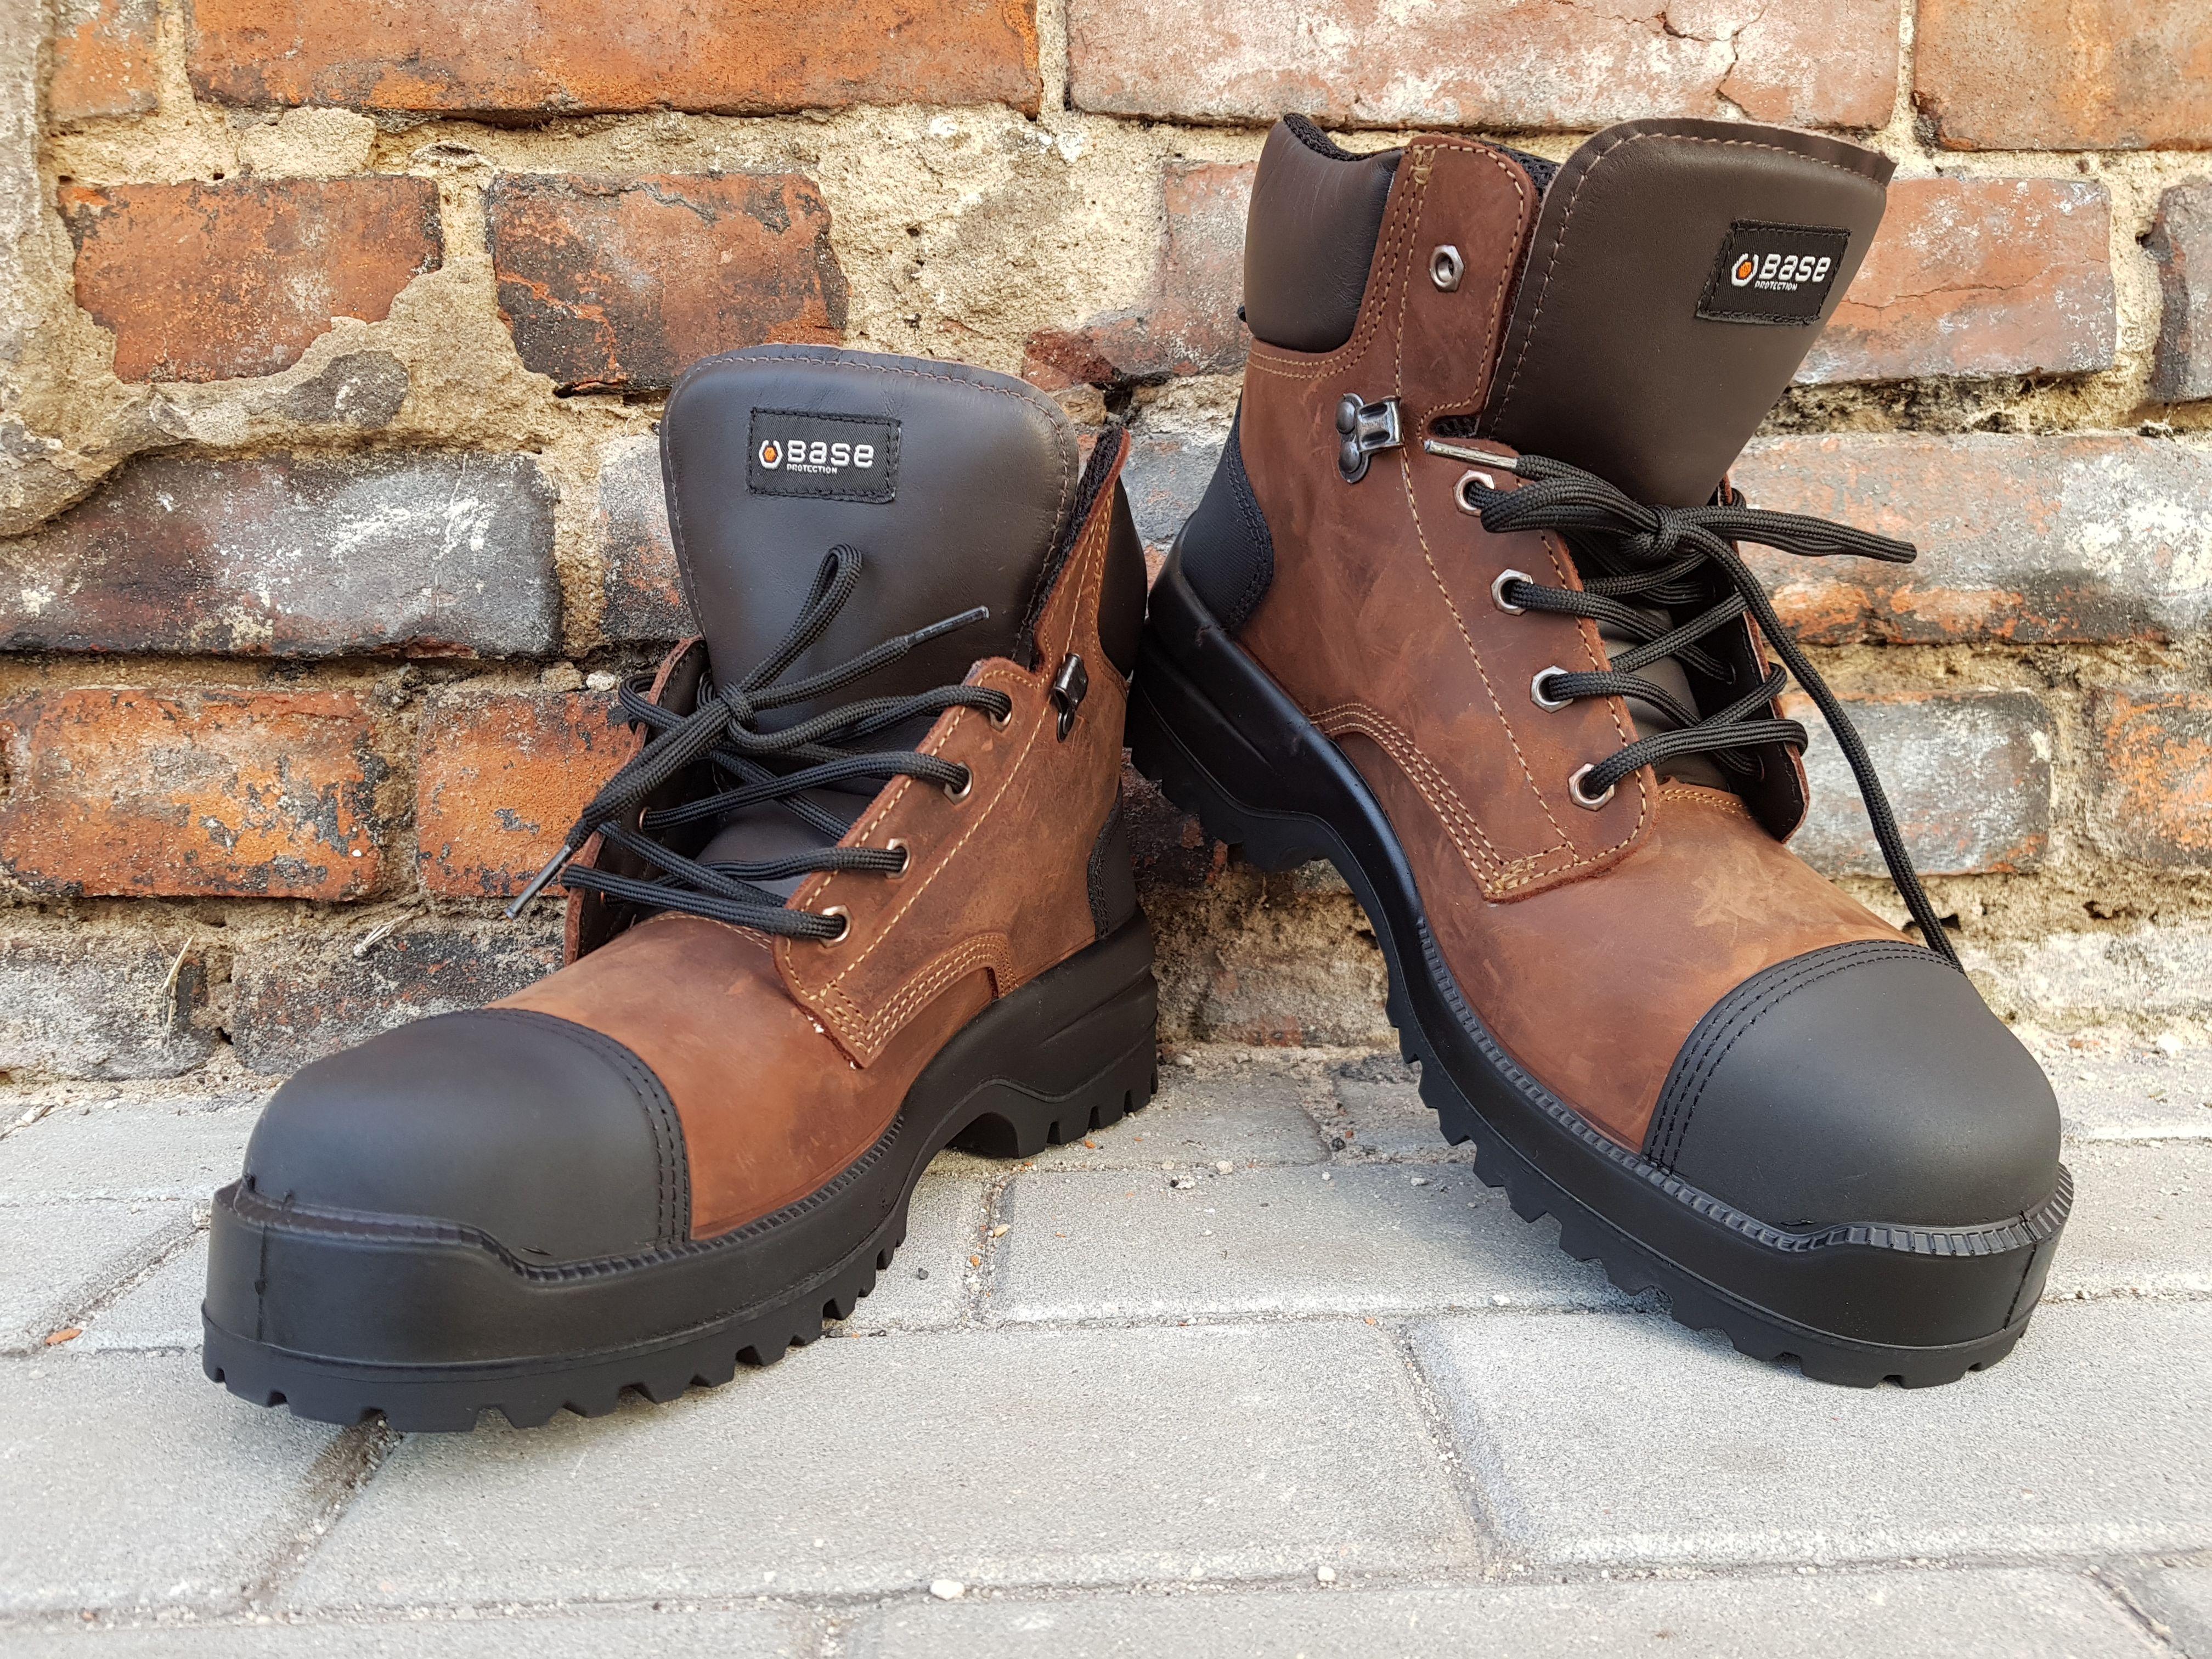 Wloska Robota W Najlepszym Stylu Italy Workboots Workwear Fashion Worksyle Baseprotection Balticbhp Boots Hiking Boots Combat Boots